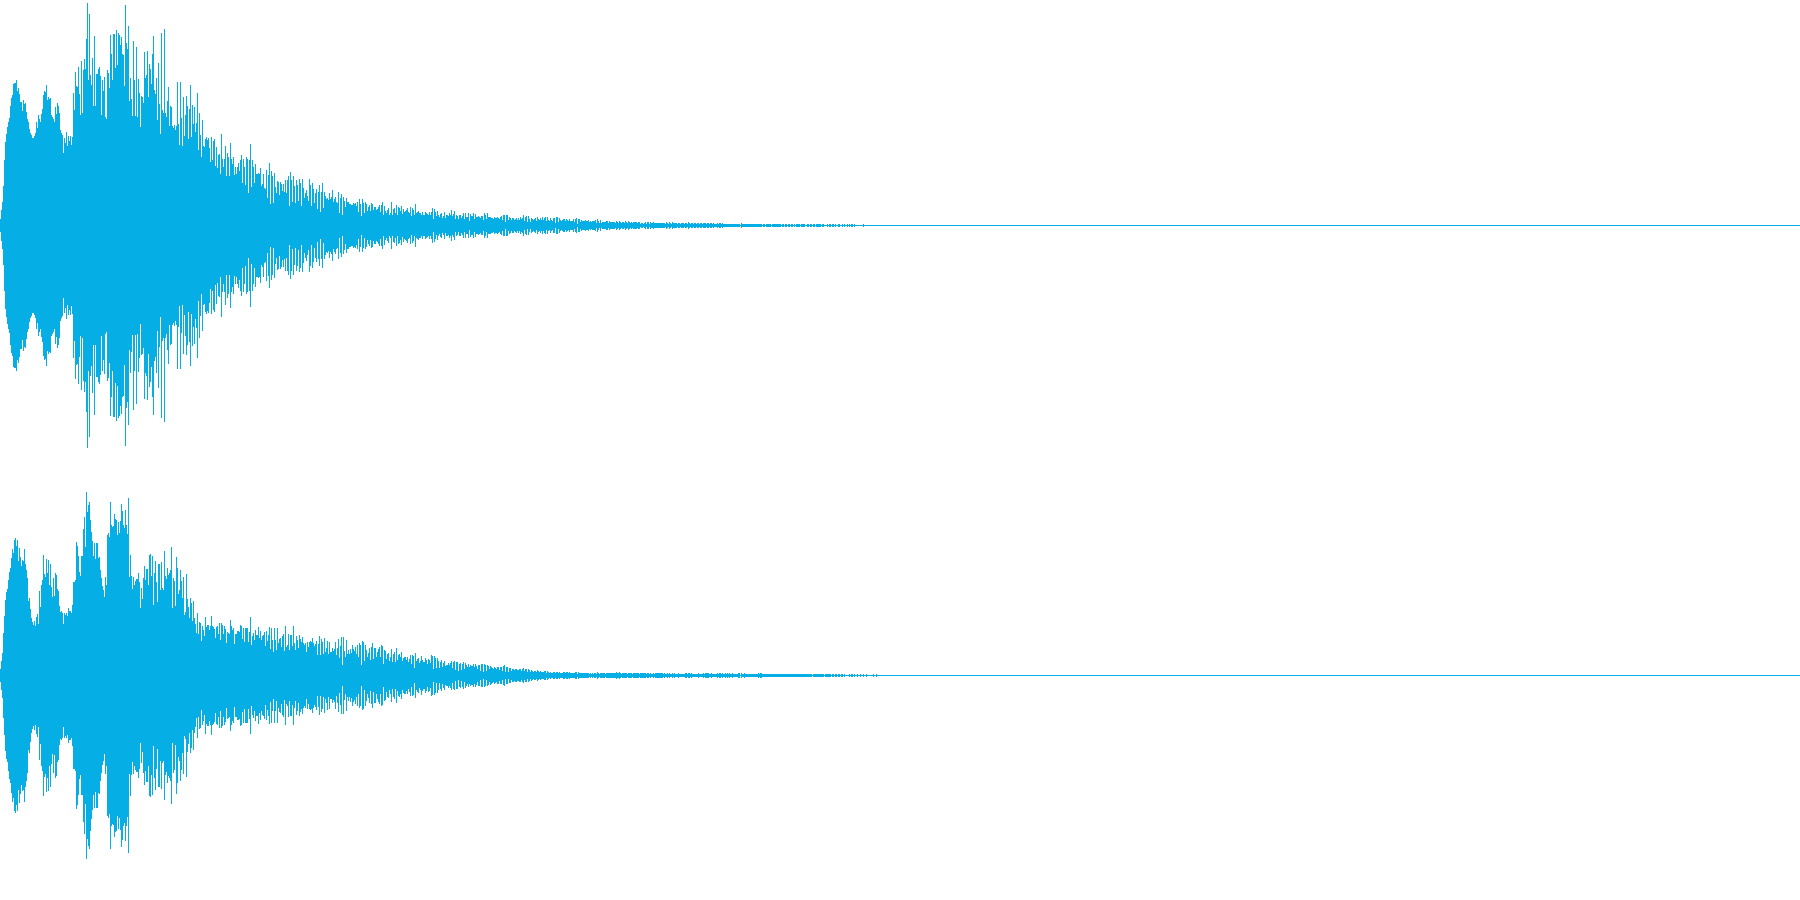 理科 化学 実験 変化 不思議 24の再生済みの波形